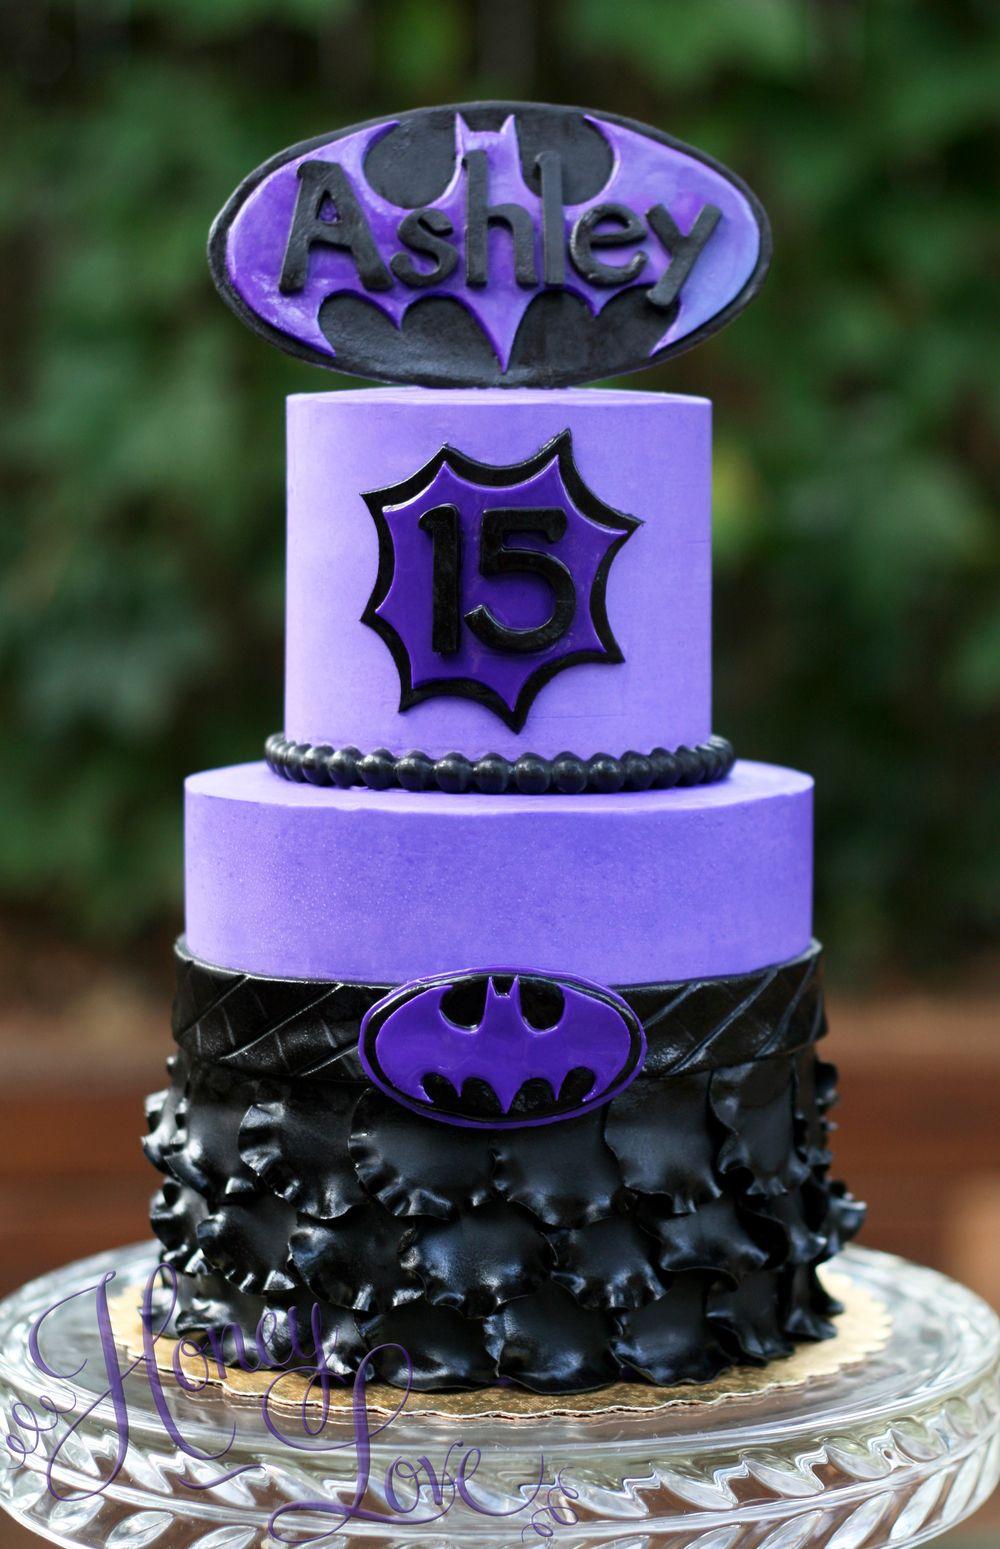 1000 ideas about superman cakes on pinterest batman cakes - 4a Jpg 1000 1549 Teen Cakesgirl